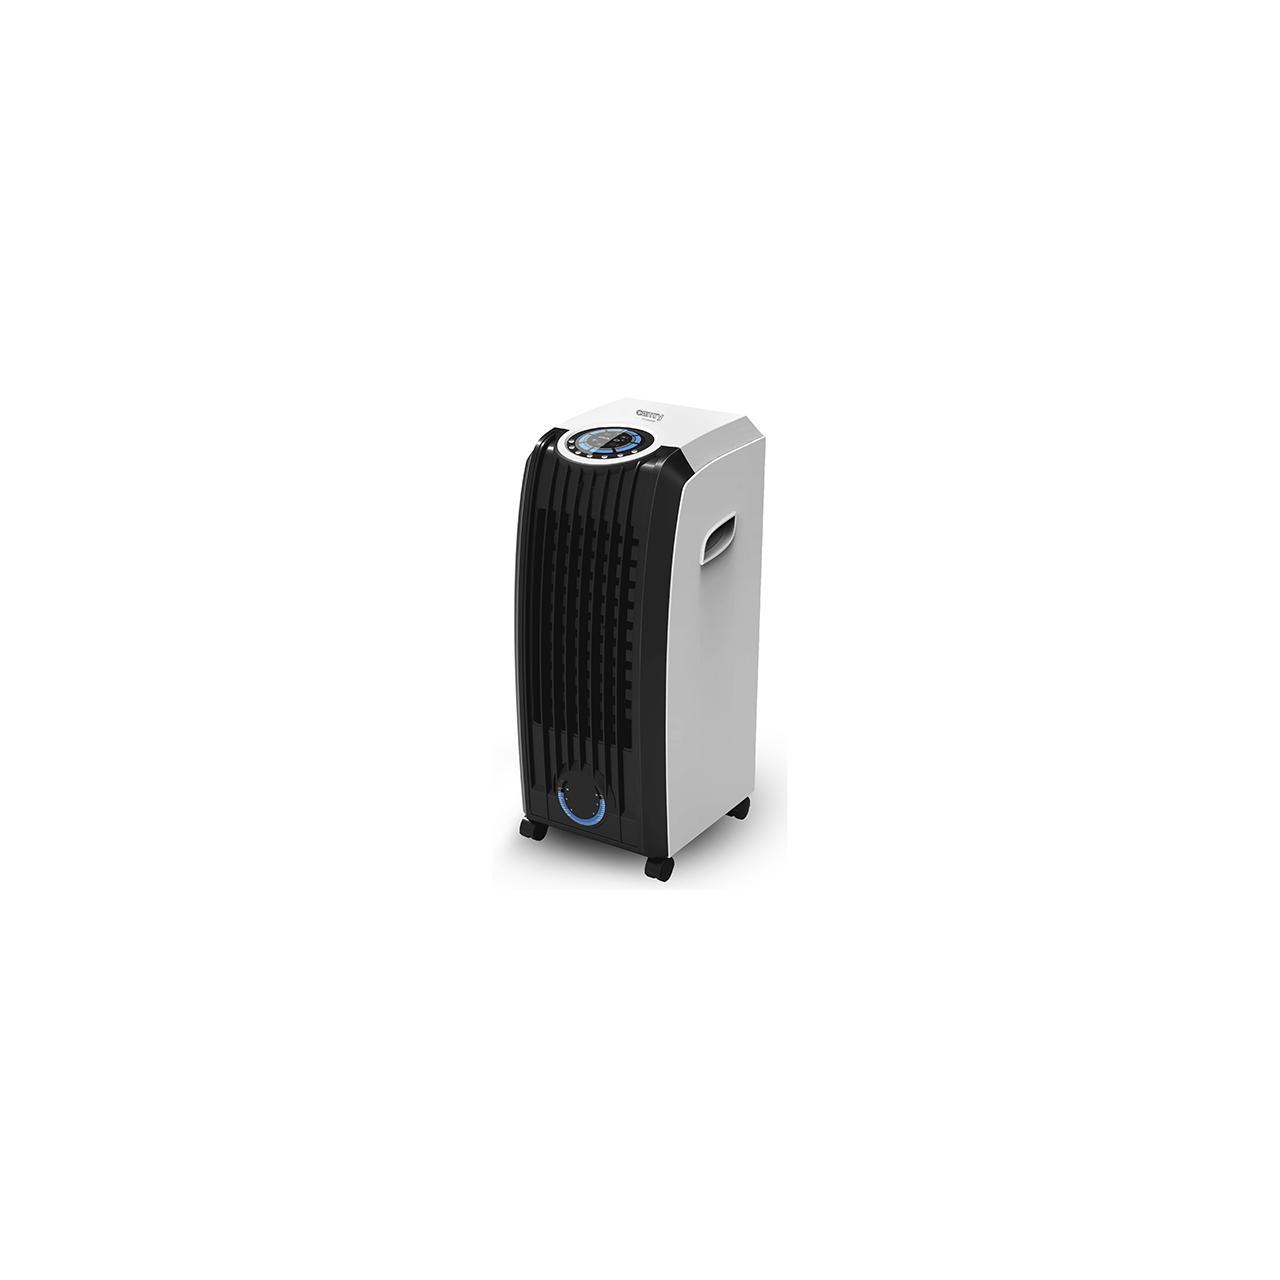 Aparat de aer conditionat 4 in 1 portabil Camry CR7920, 350W, rezervor de apa de 8l, 3 moduri de ventilare, telecomanda, Panou de control LED, Alb/Negru